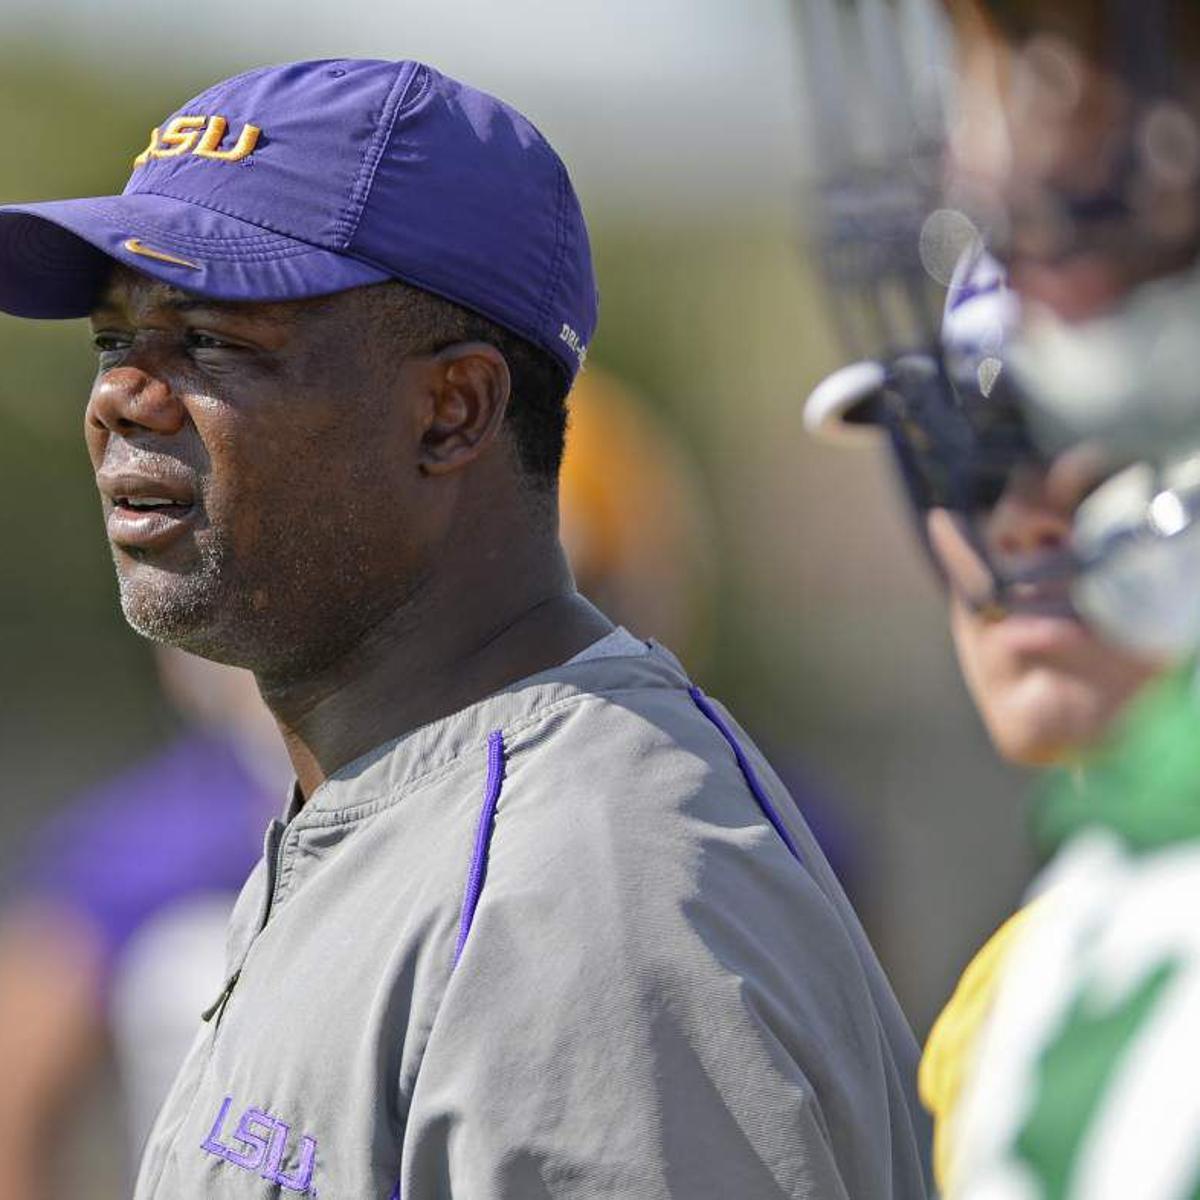 Utsa Calendar 2020 Report: LSU football adds game with UTSA, former assistant coach